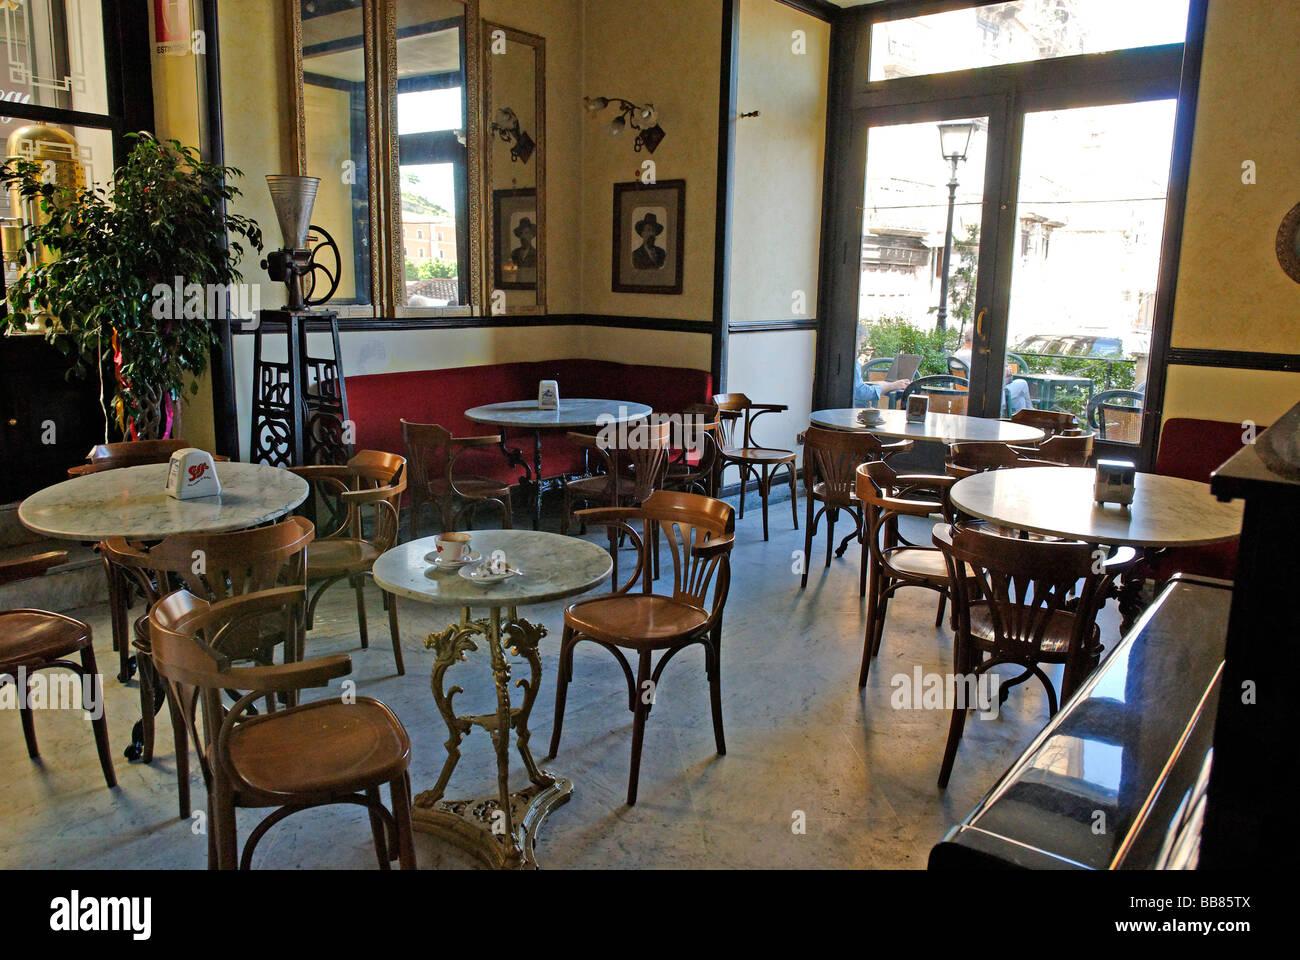 Gran Caffè Renzelli historical cafè, near the cathedral, Cosenza, Calabria, Italy, Europe - Stock Image